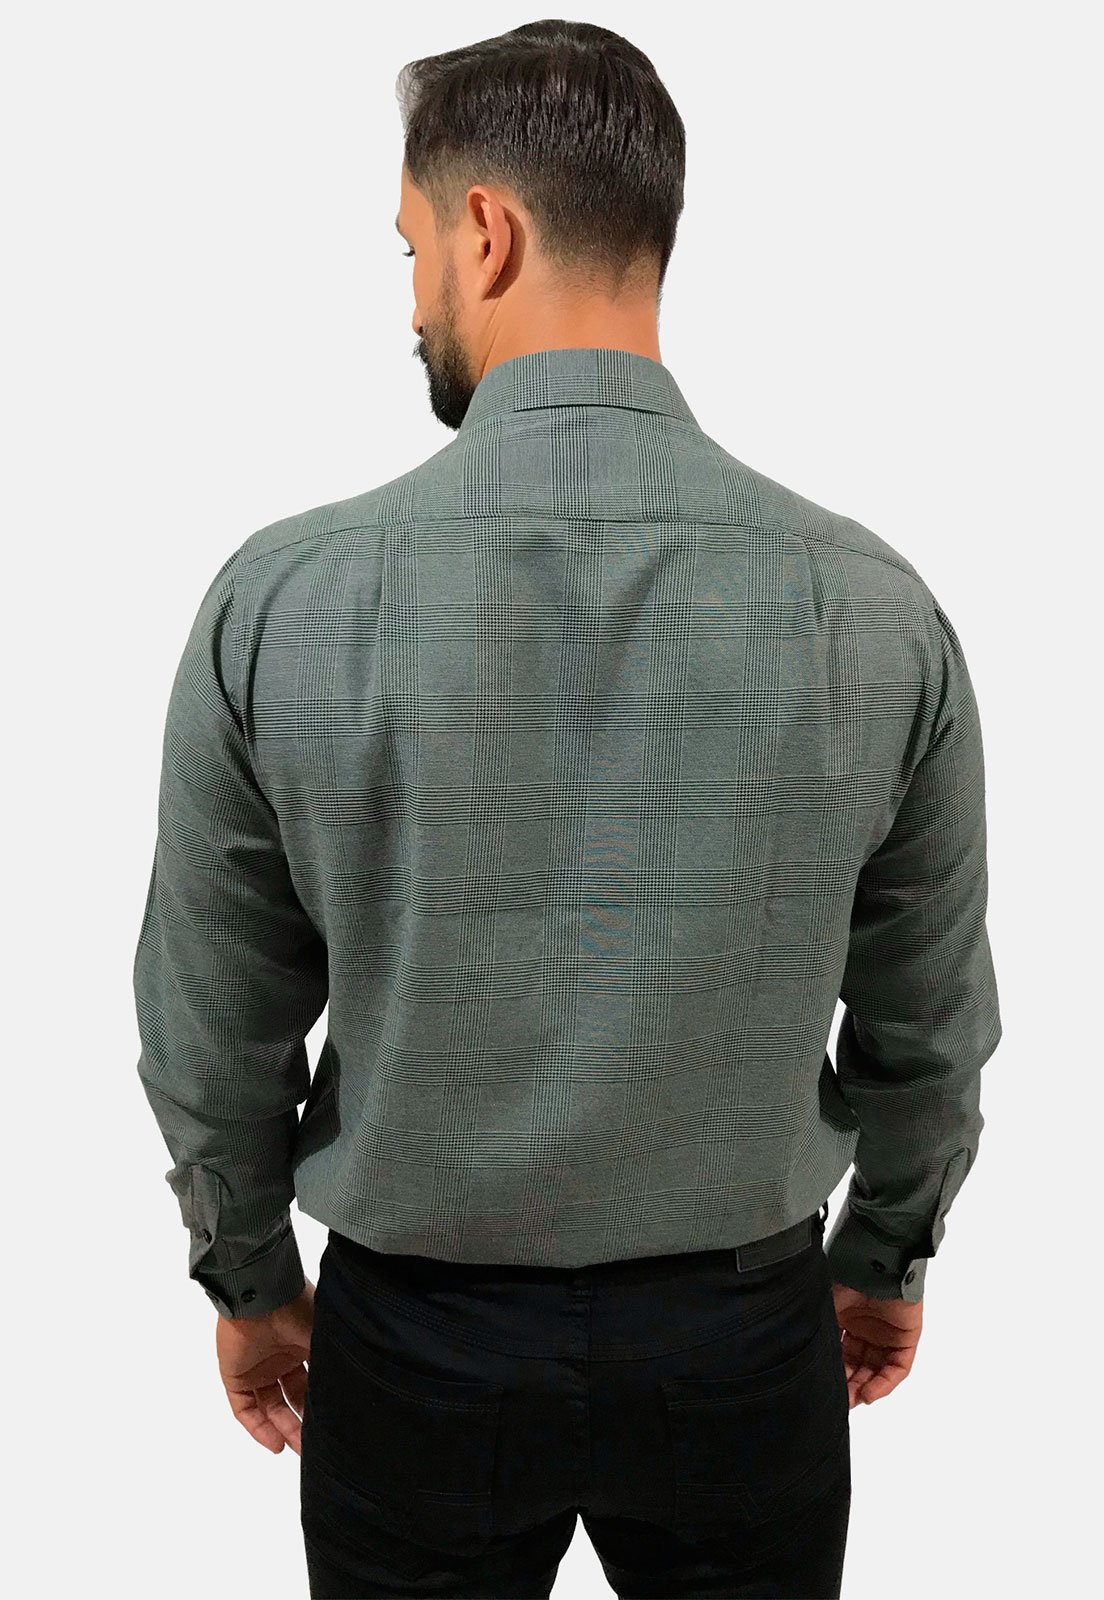 Camisa Social Masculina Olimpo Plus Size Maquinetada com Bolso Manga Longa